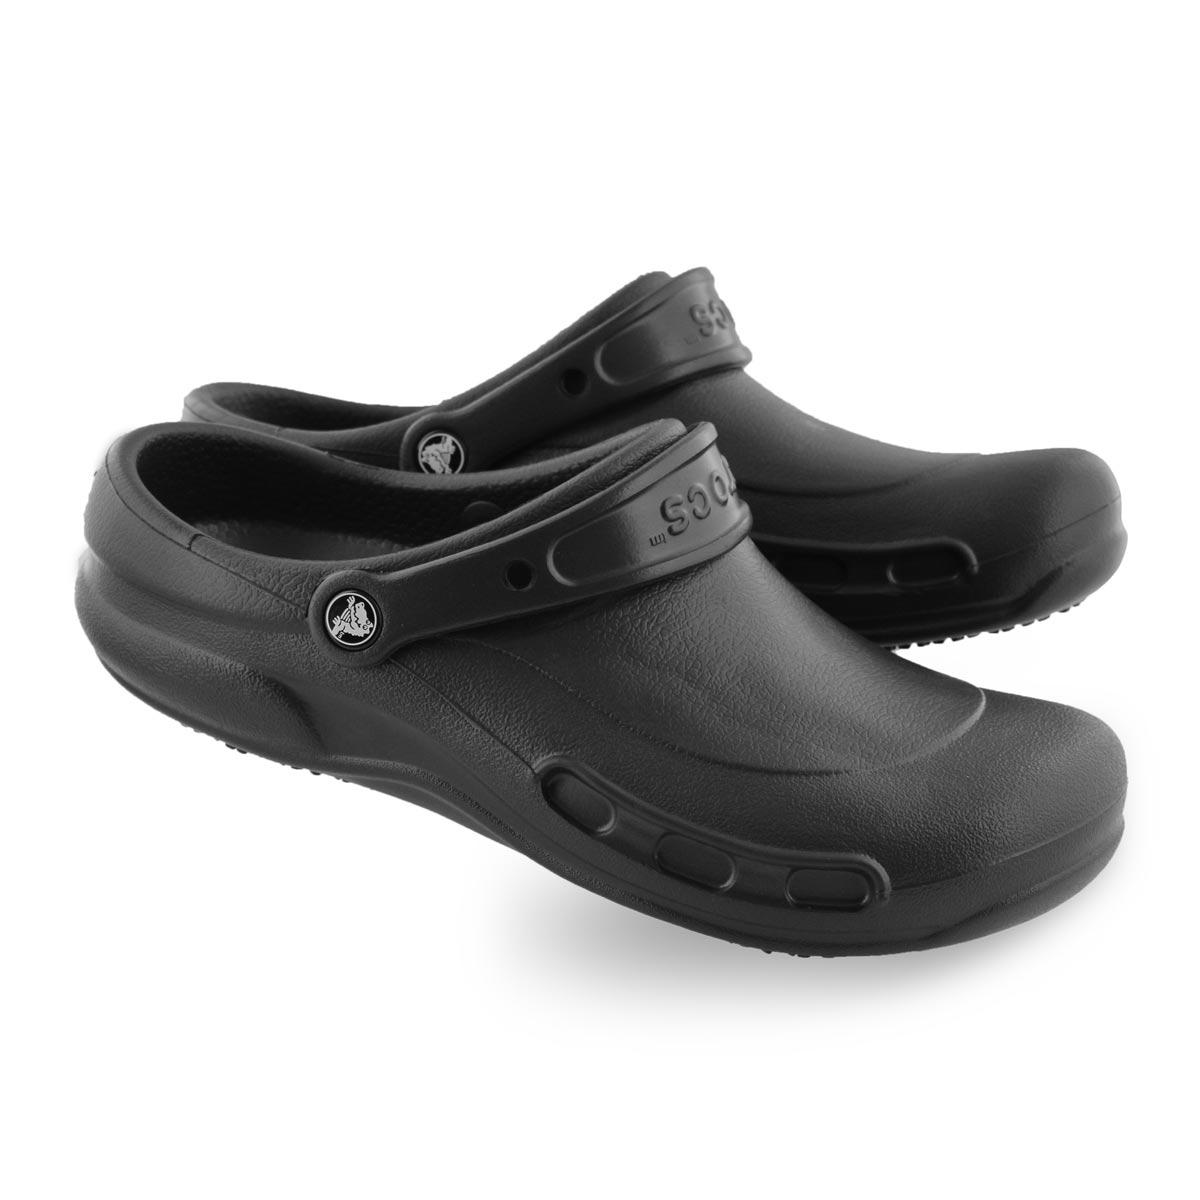 Lds Bistro black casual clog